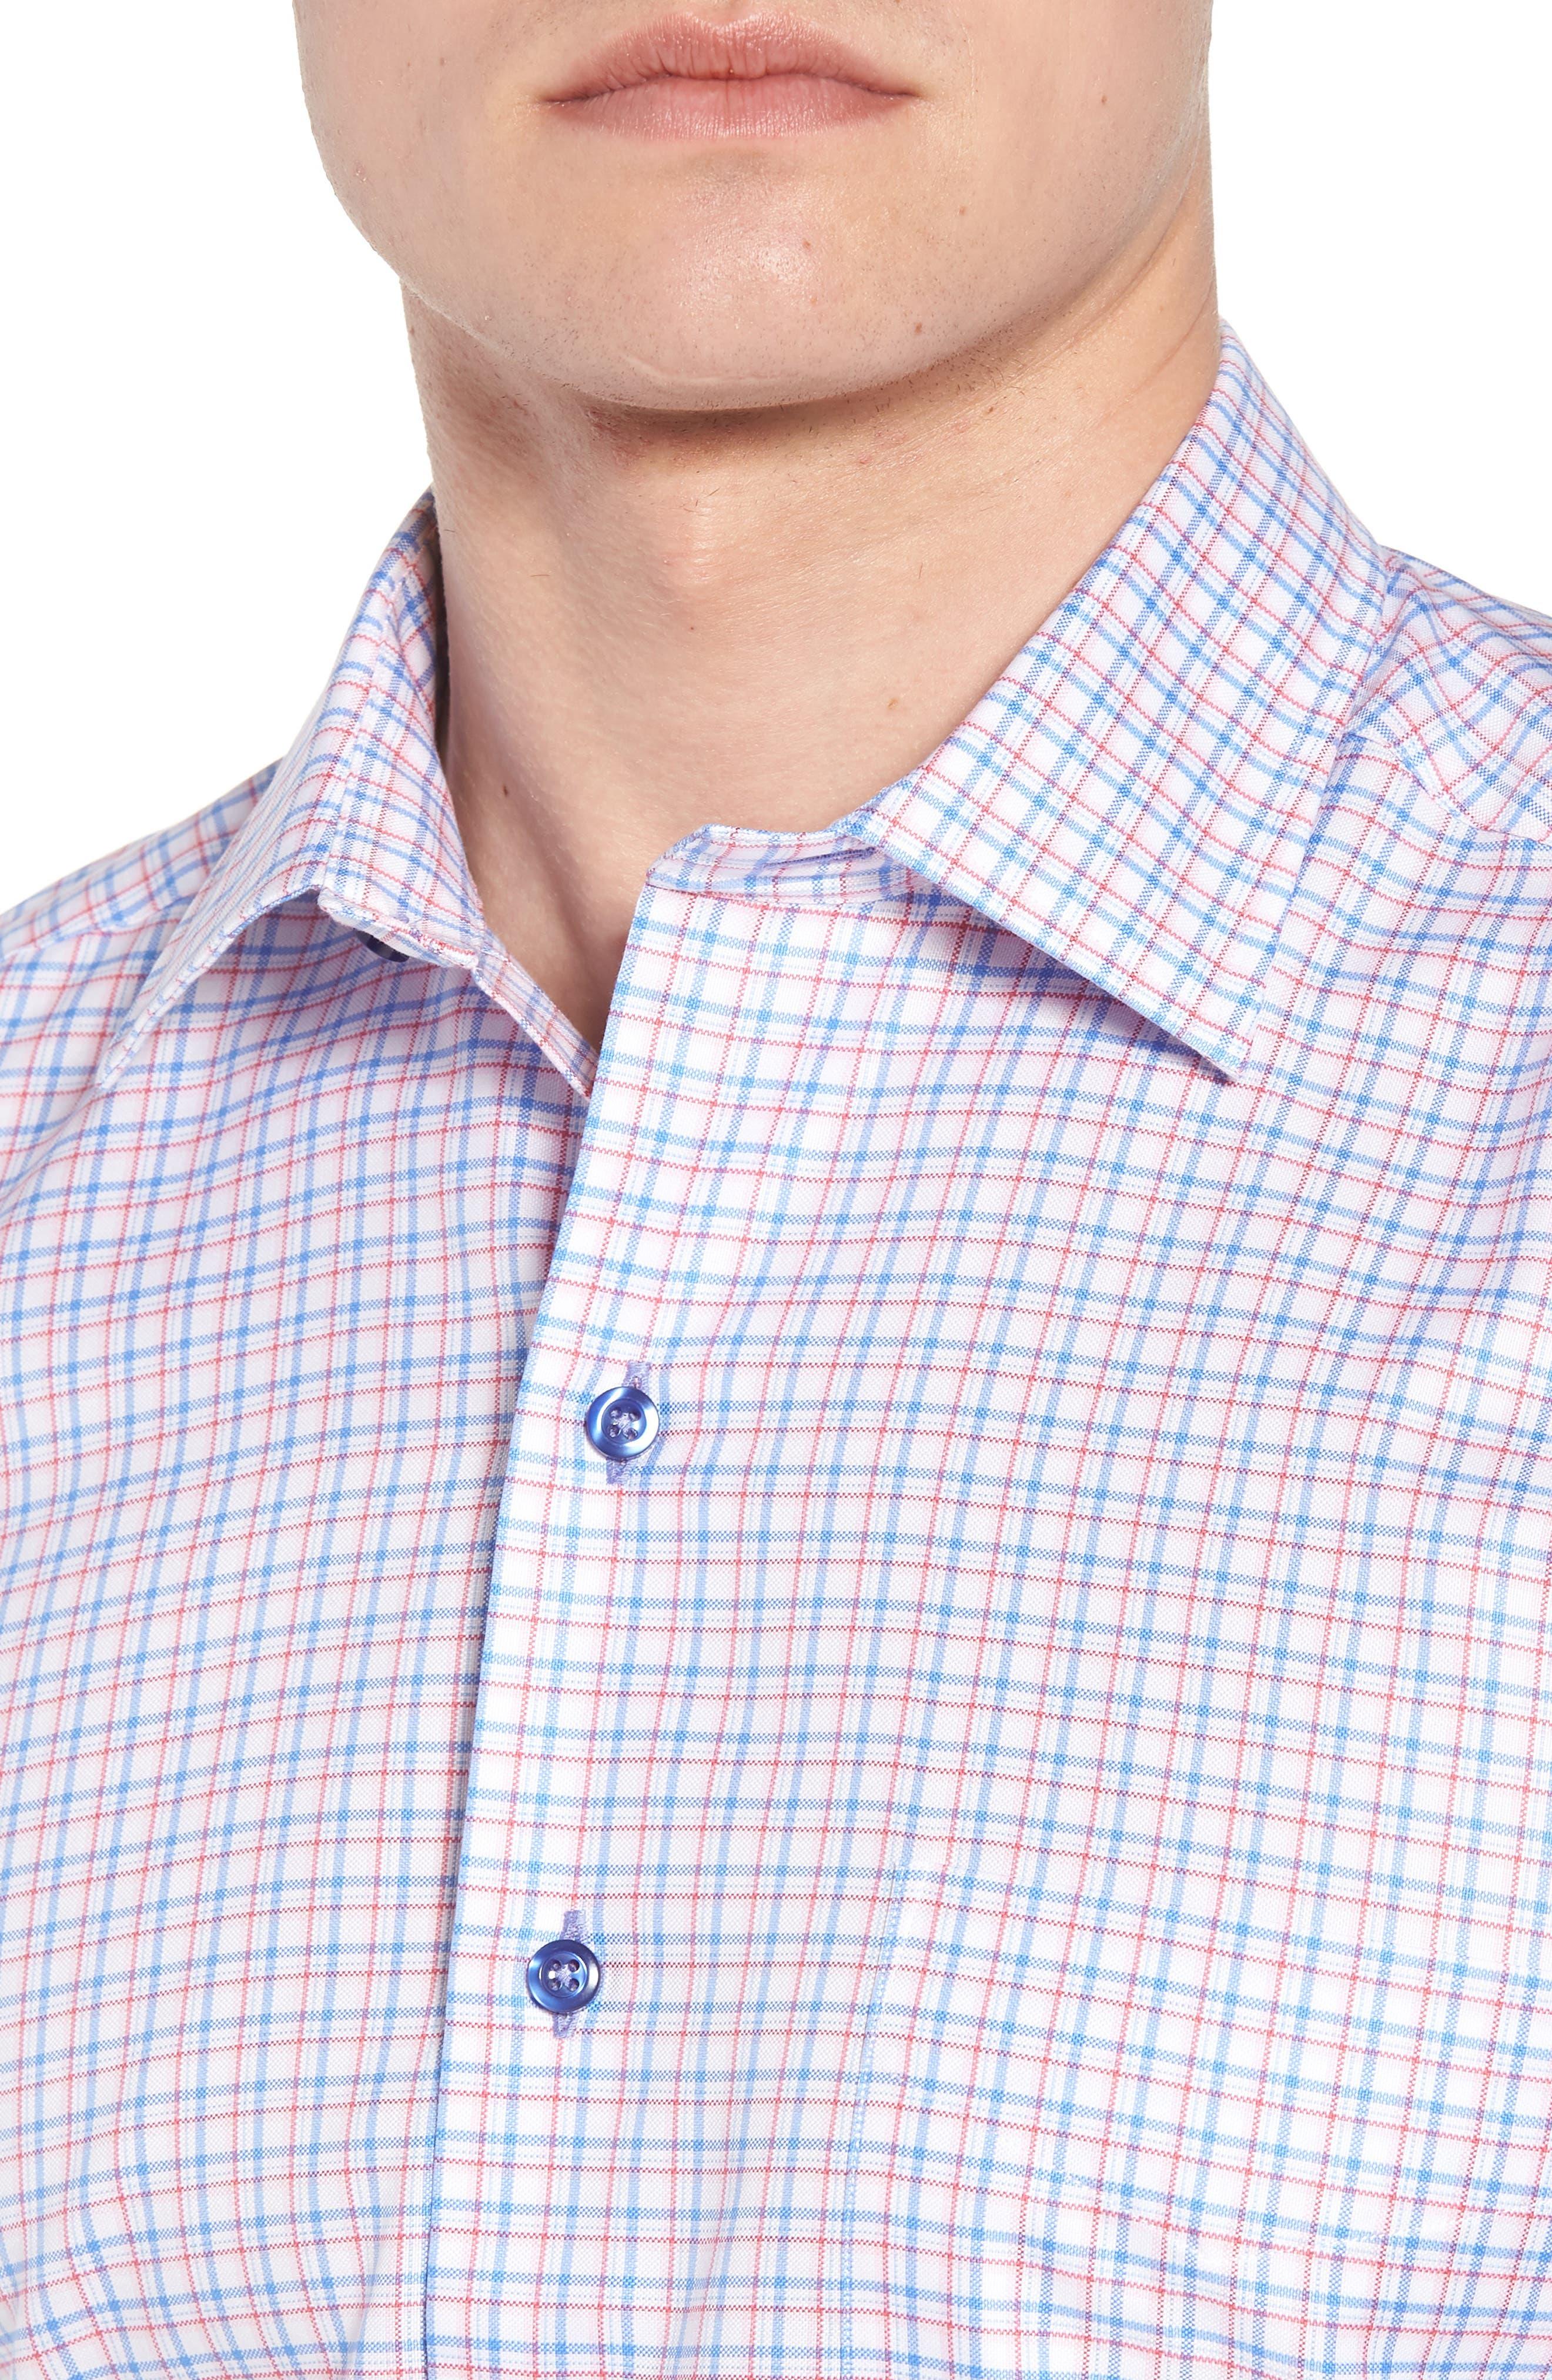 Regular Fit Check Sport Shirt,                             Alternate thumbnail 4, color,                             Blue/ Pink